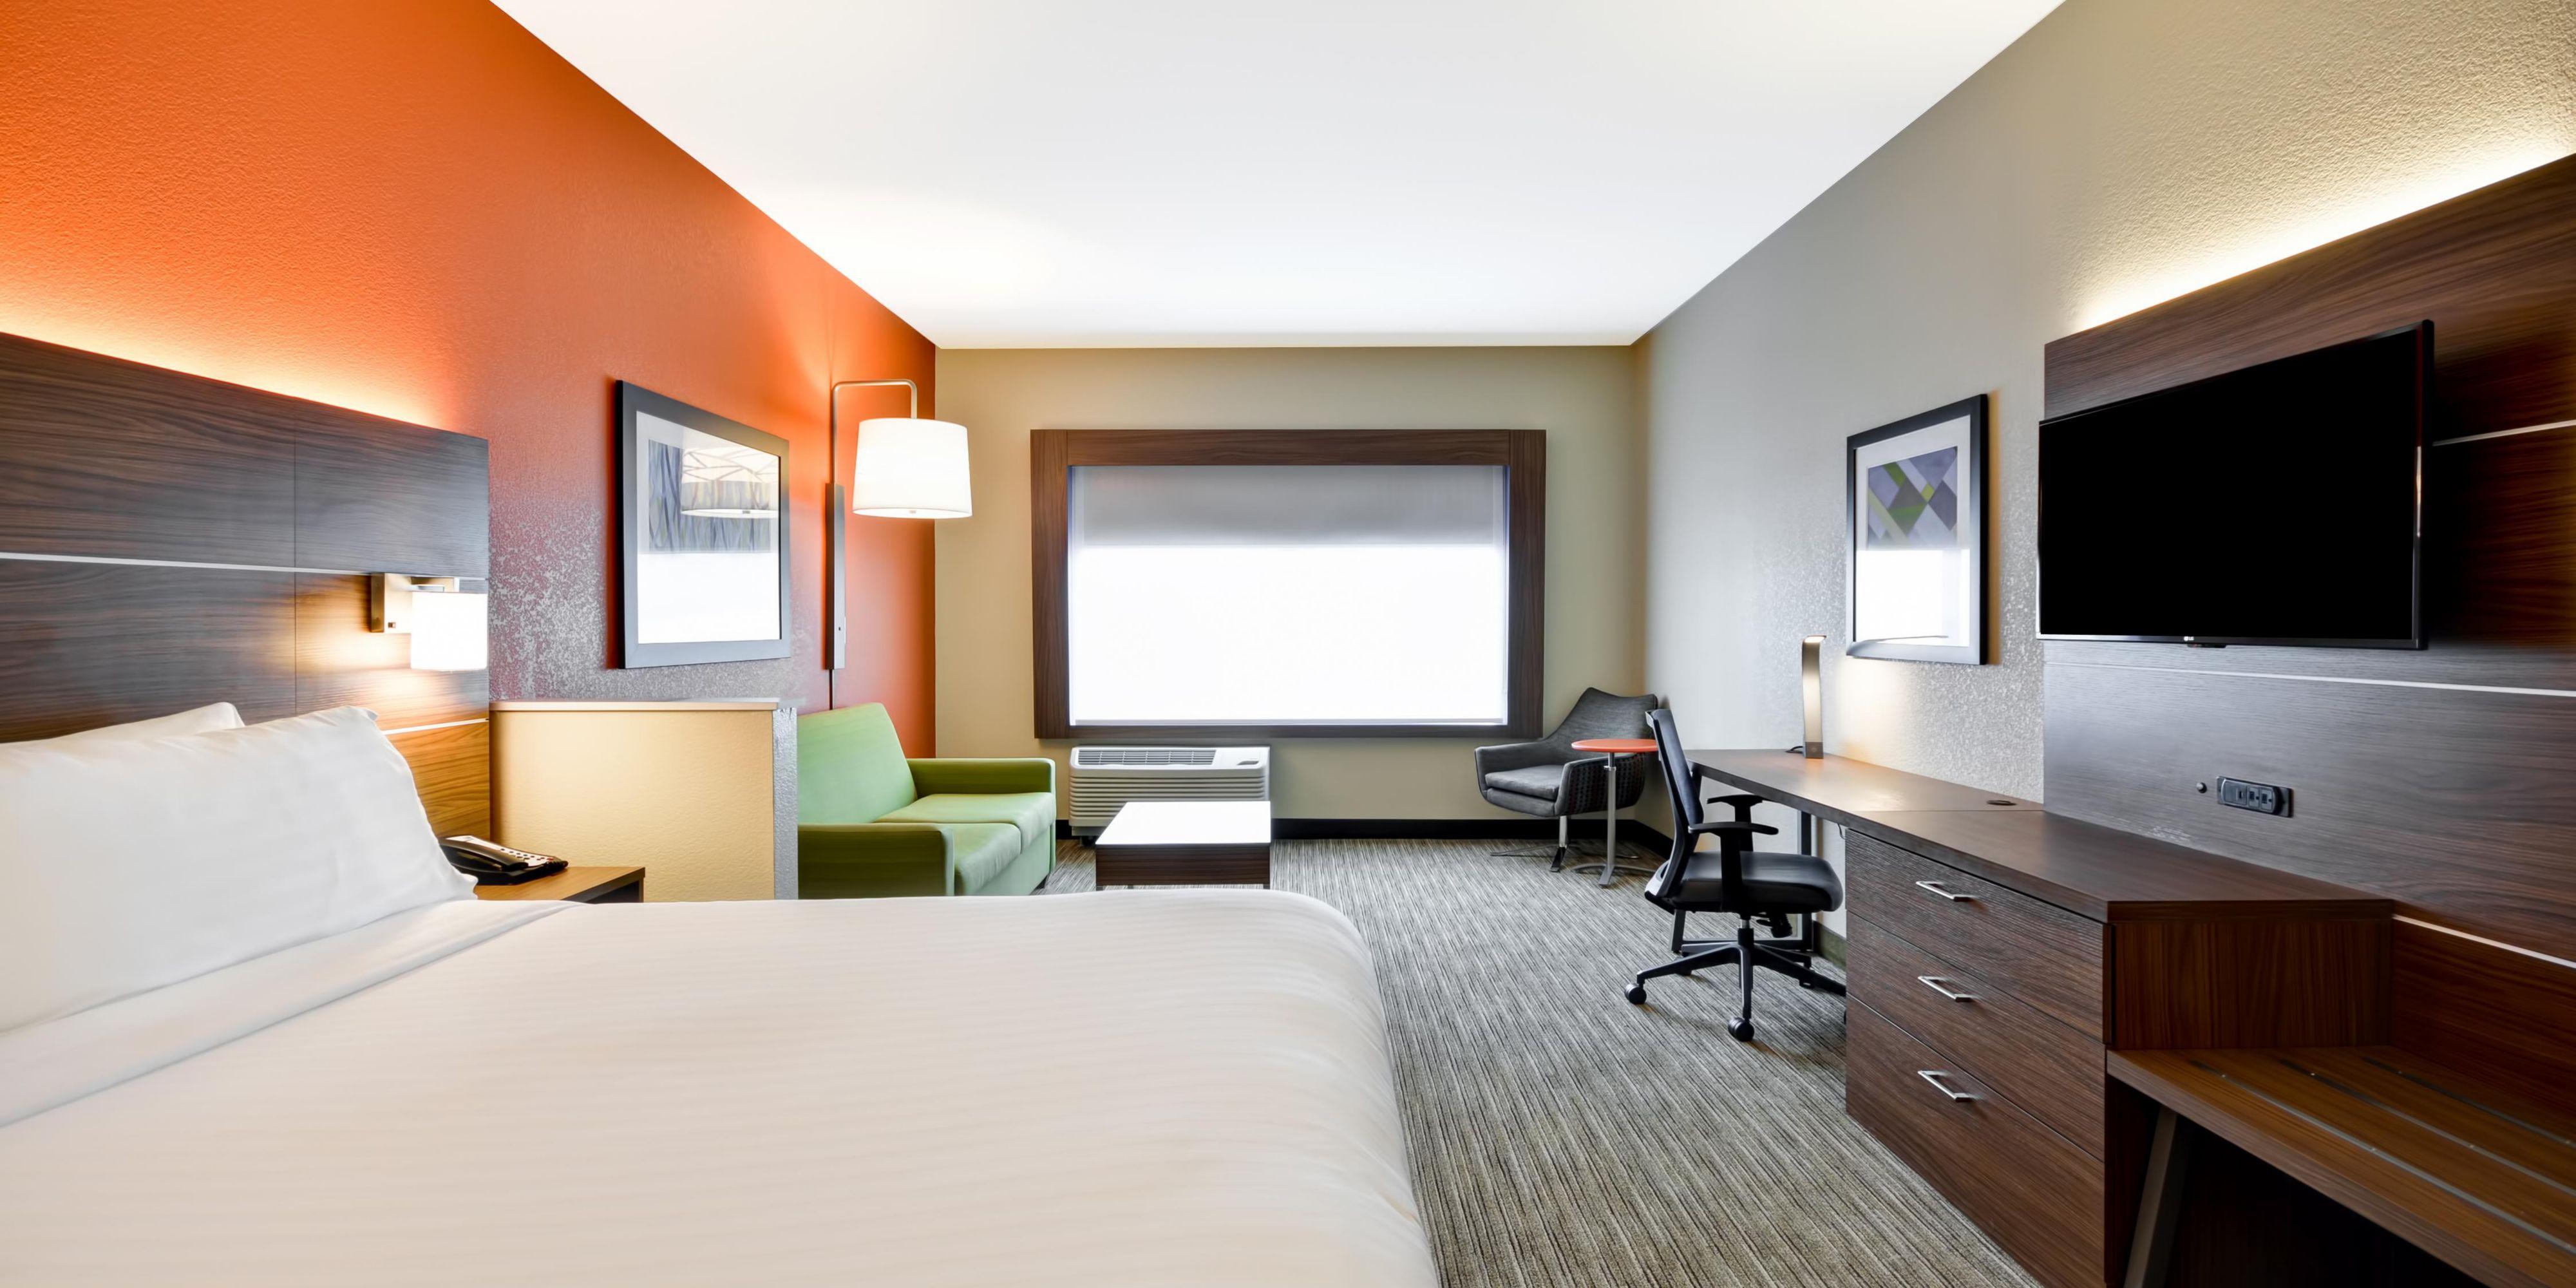 Holiday Inn Express Evansville 5001441724 2x1